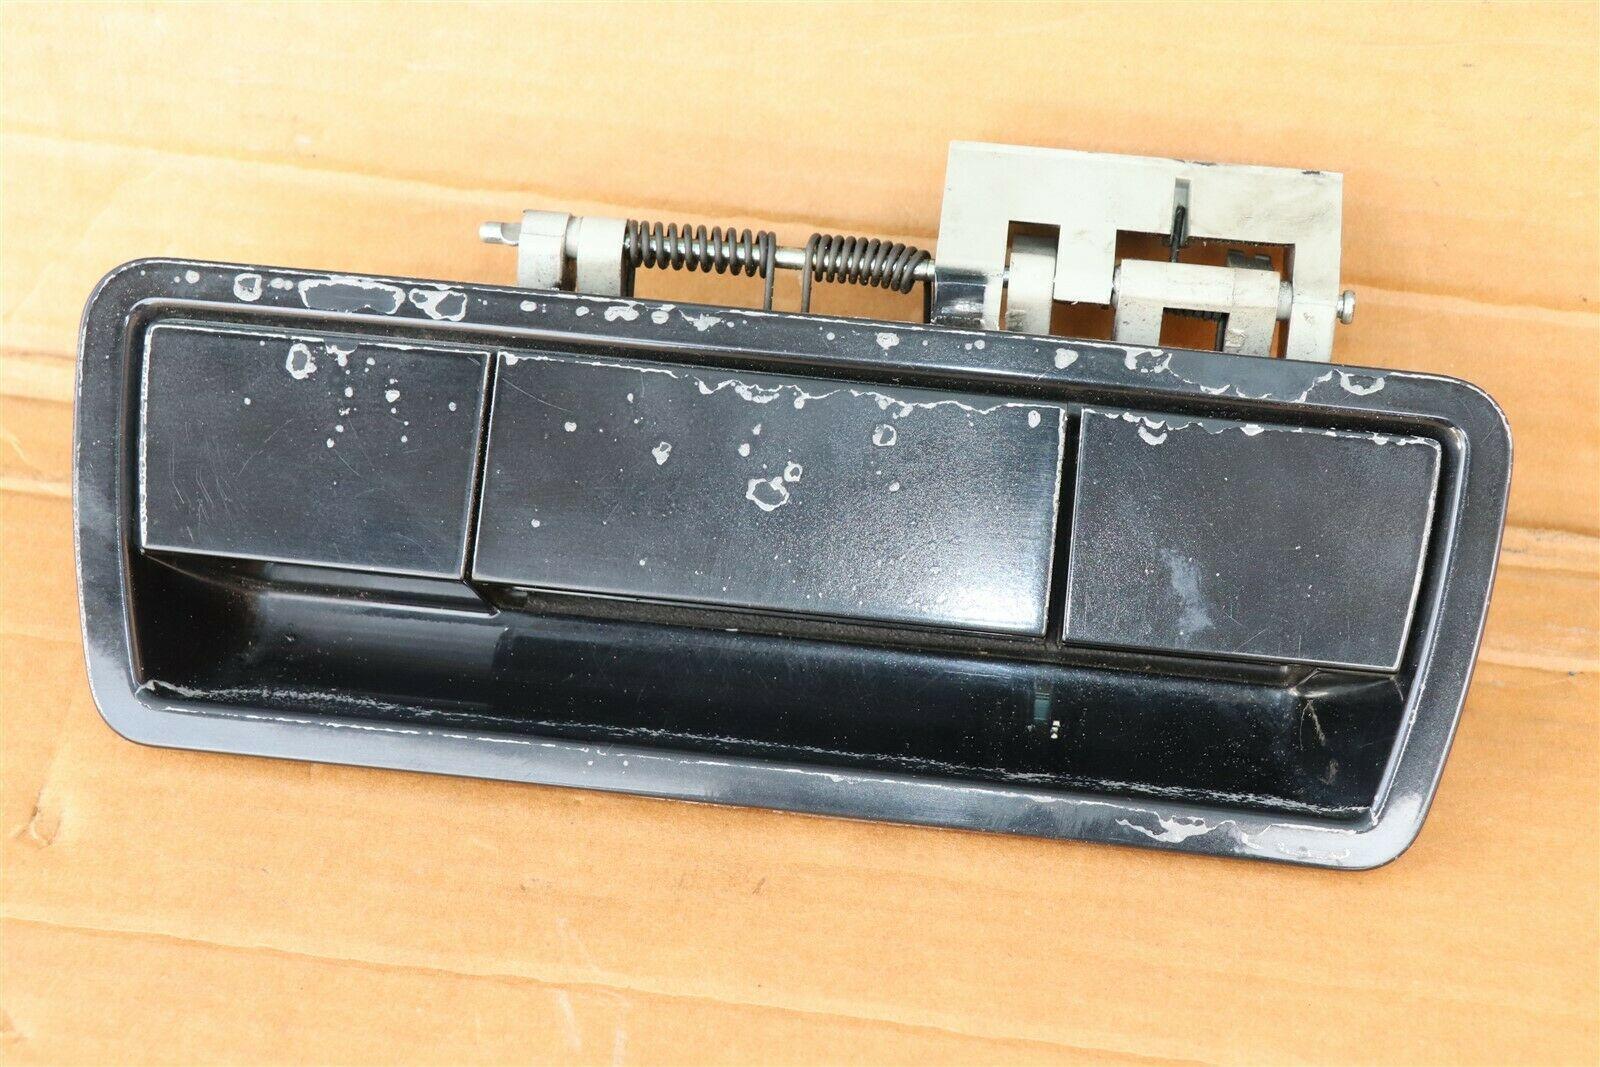 06-12 Nissan Armada Rear Hatch Tailgate Liftgate Trunk Exterior Door Handle G10